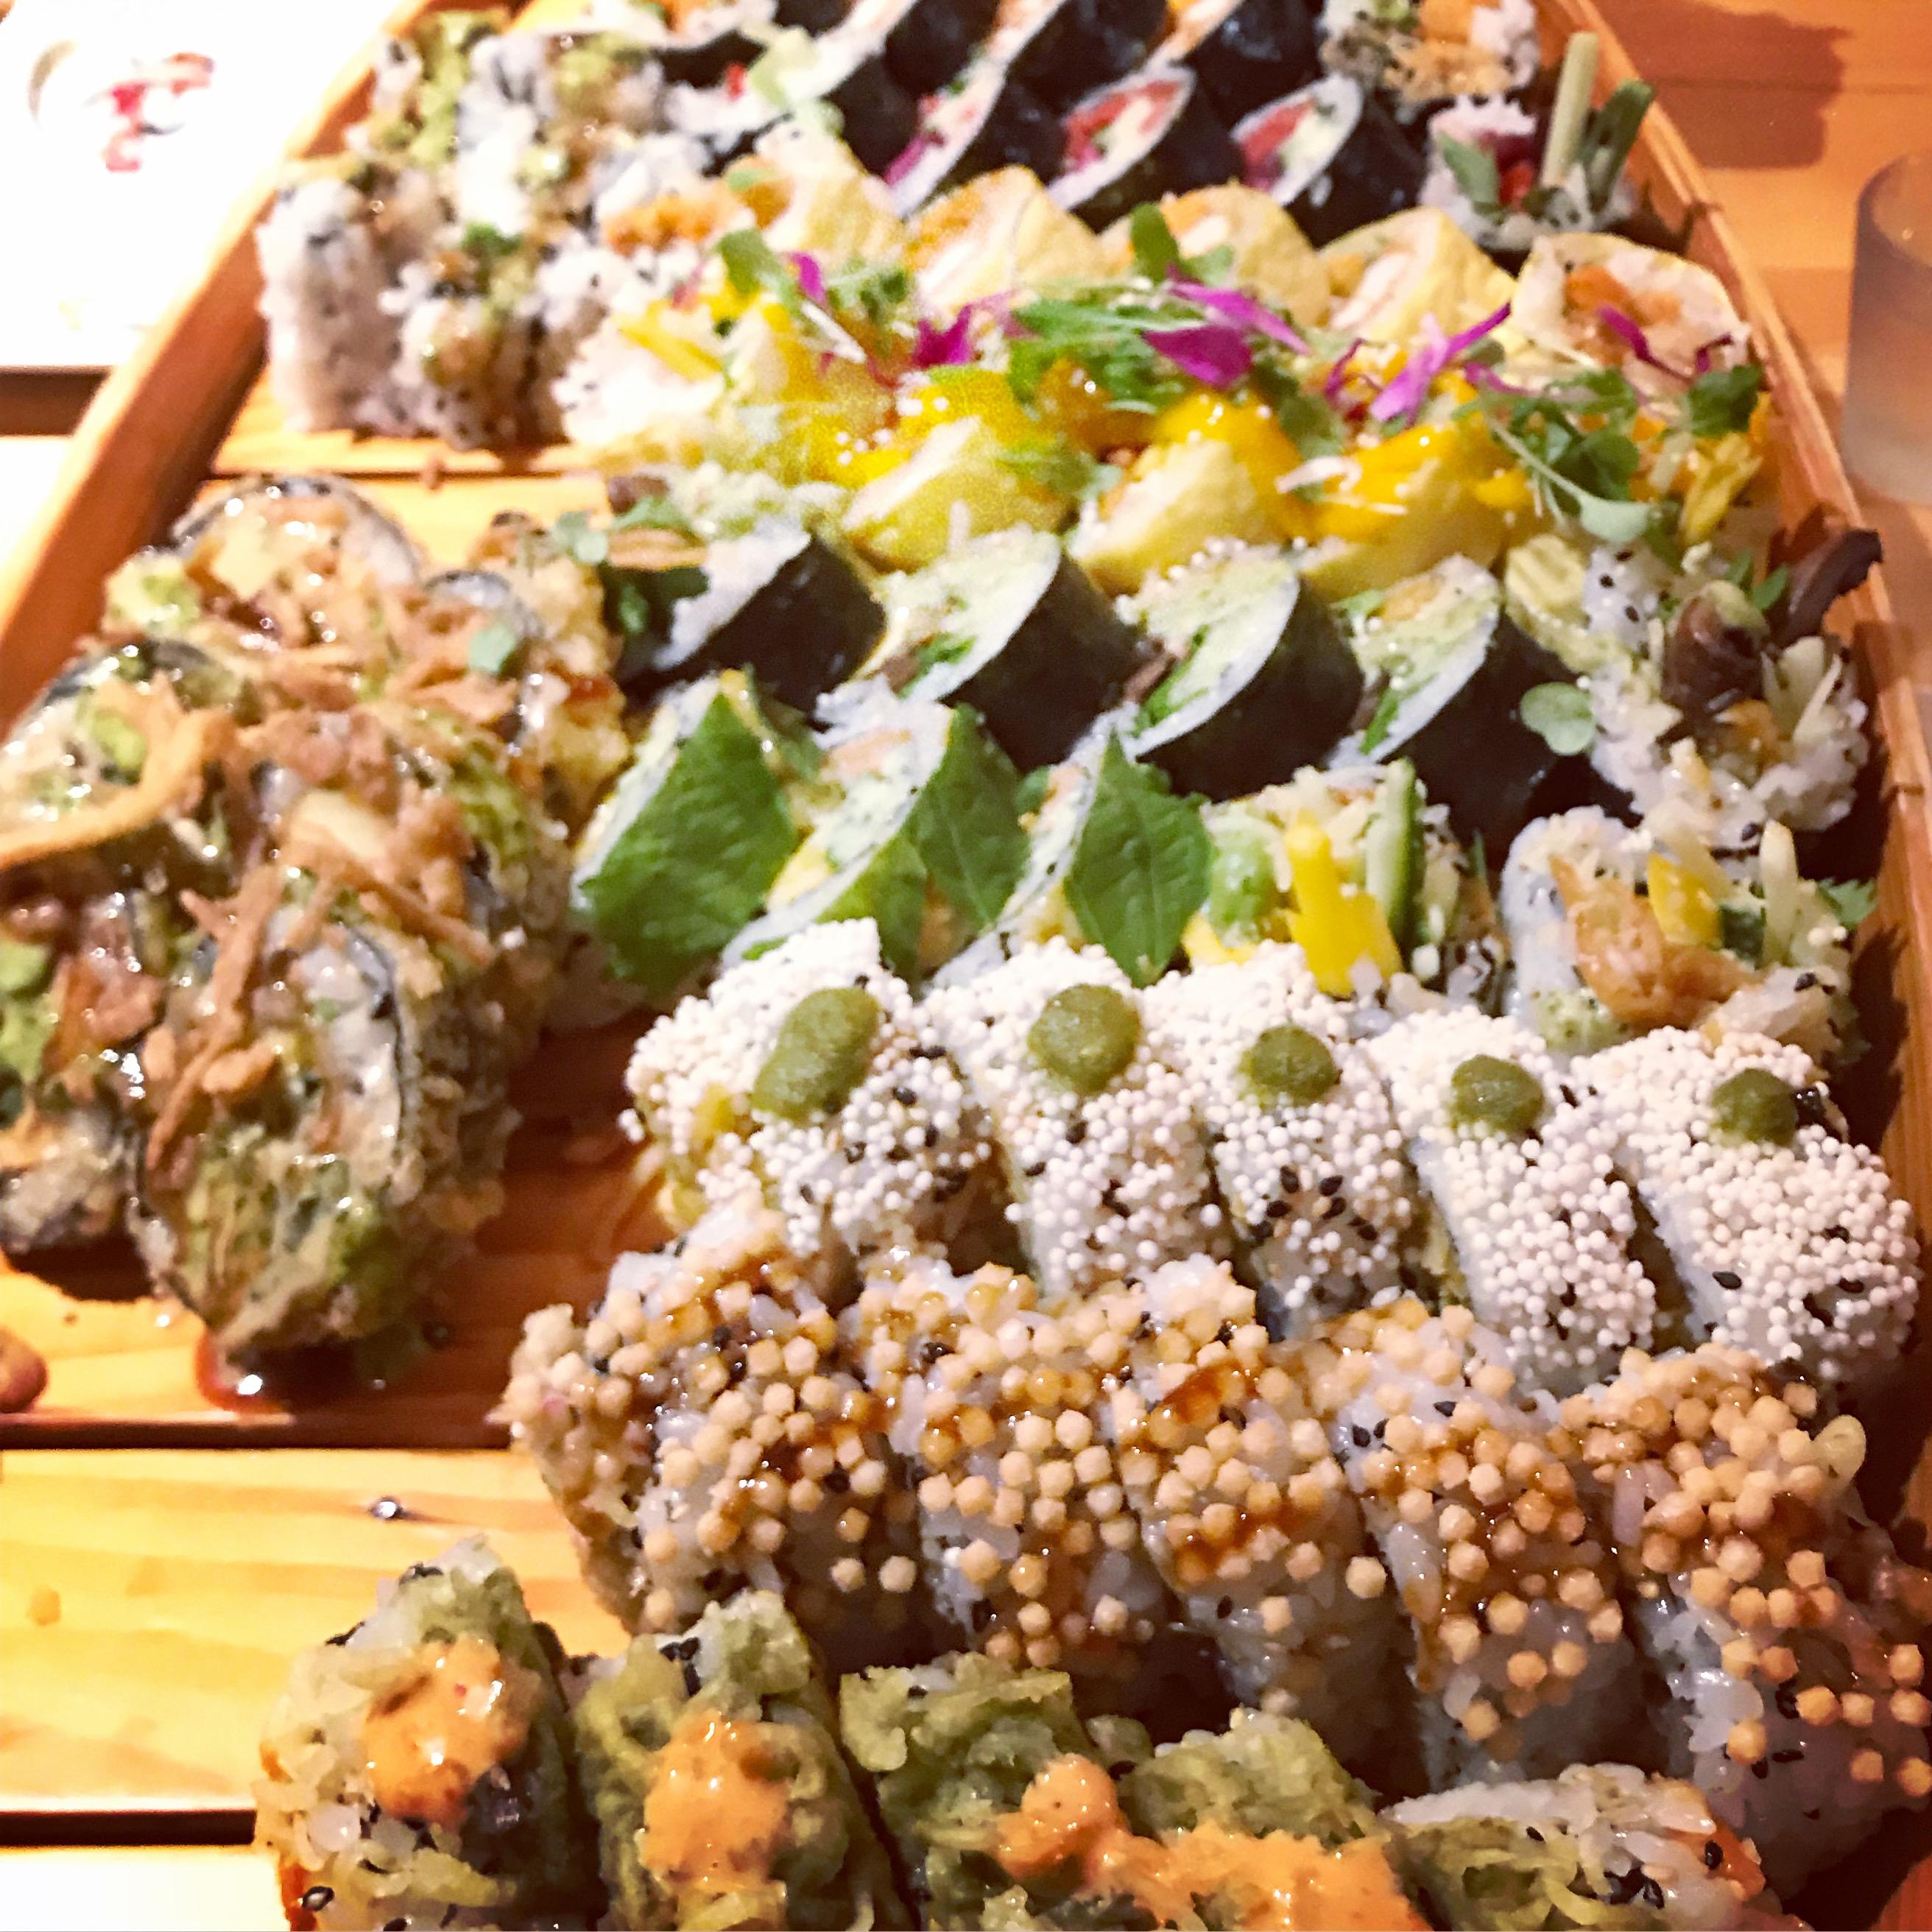 Vegan Sushi at Sushi Momo, Ms. Adventures in Italy, by Sara Rosso